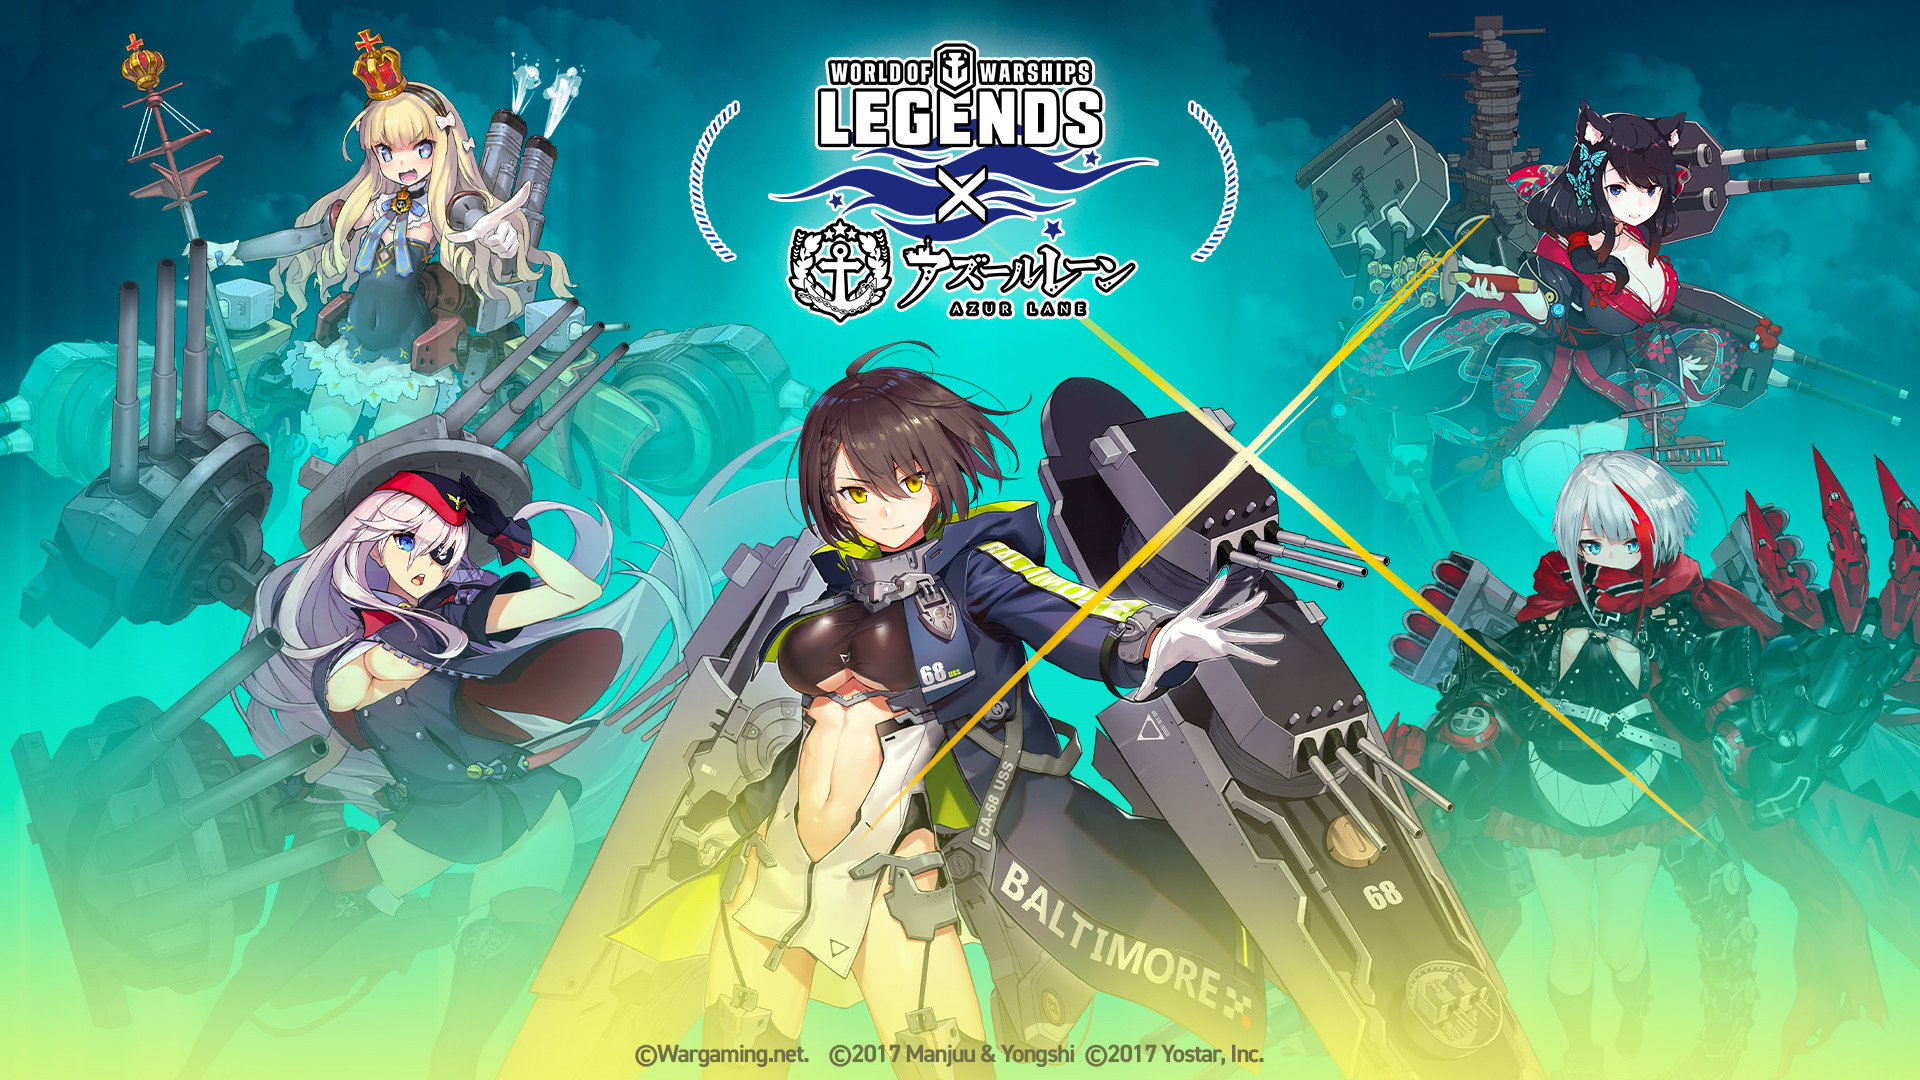 Wows Legends Become A Naval Legend